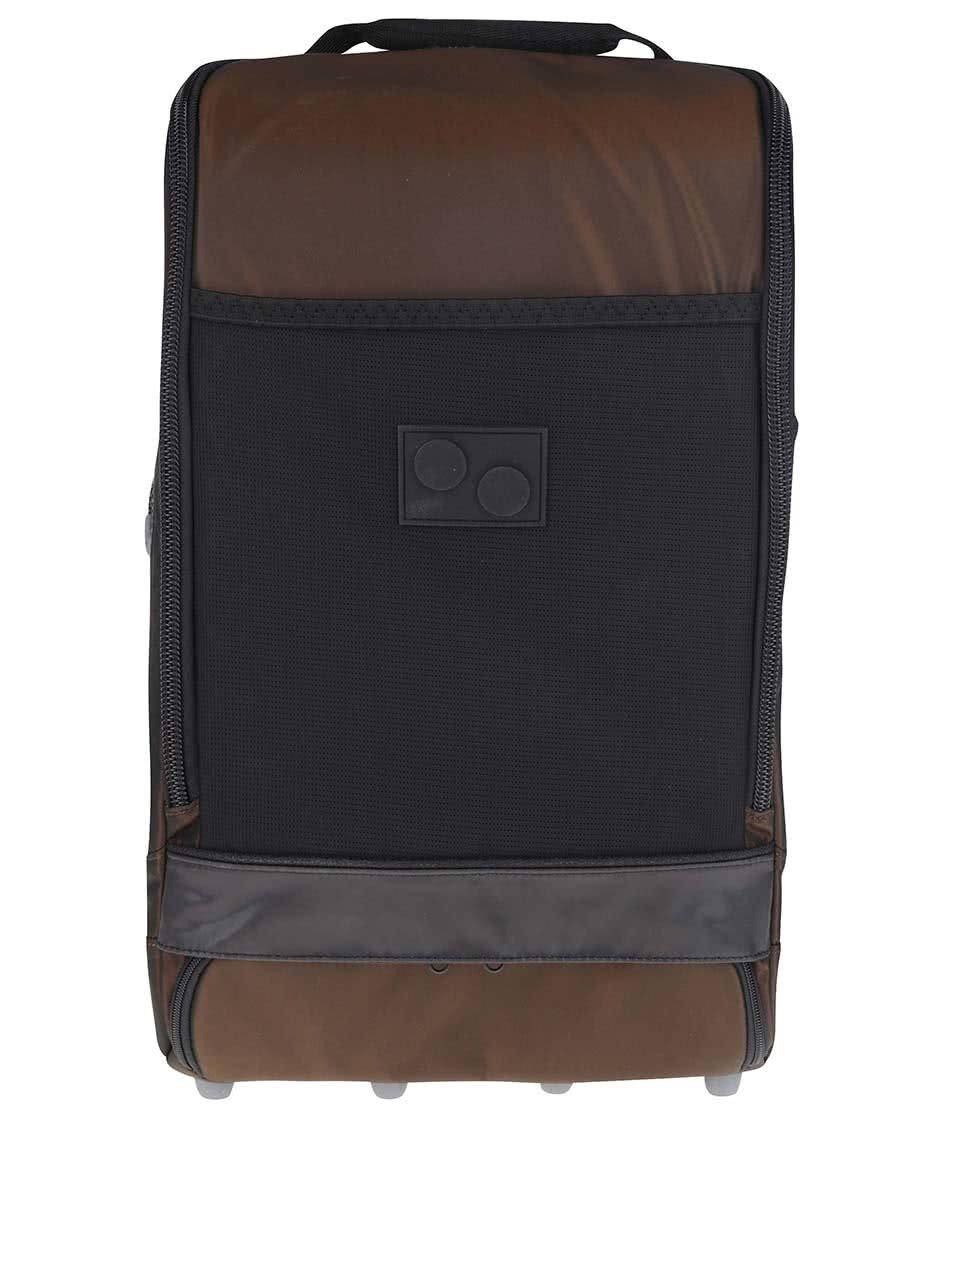 Černo-hnědý unisex batoh pinqponq Cubik Large 22 l